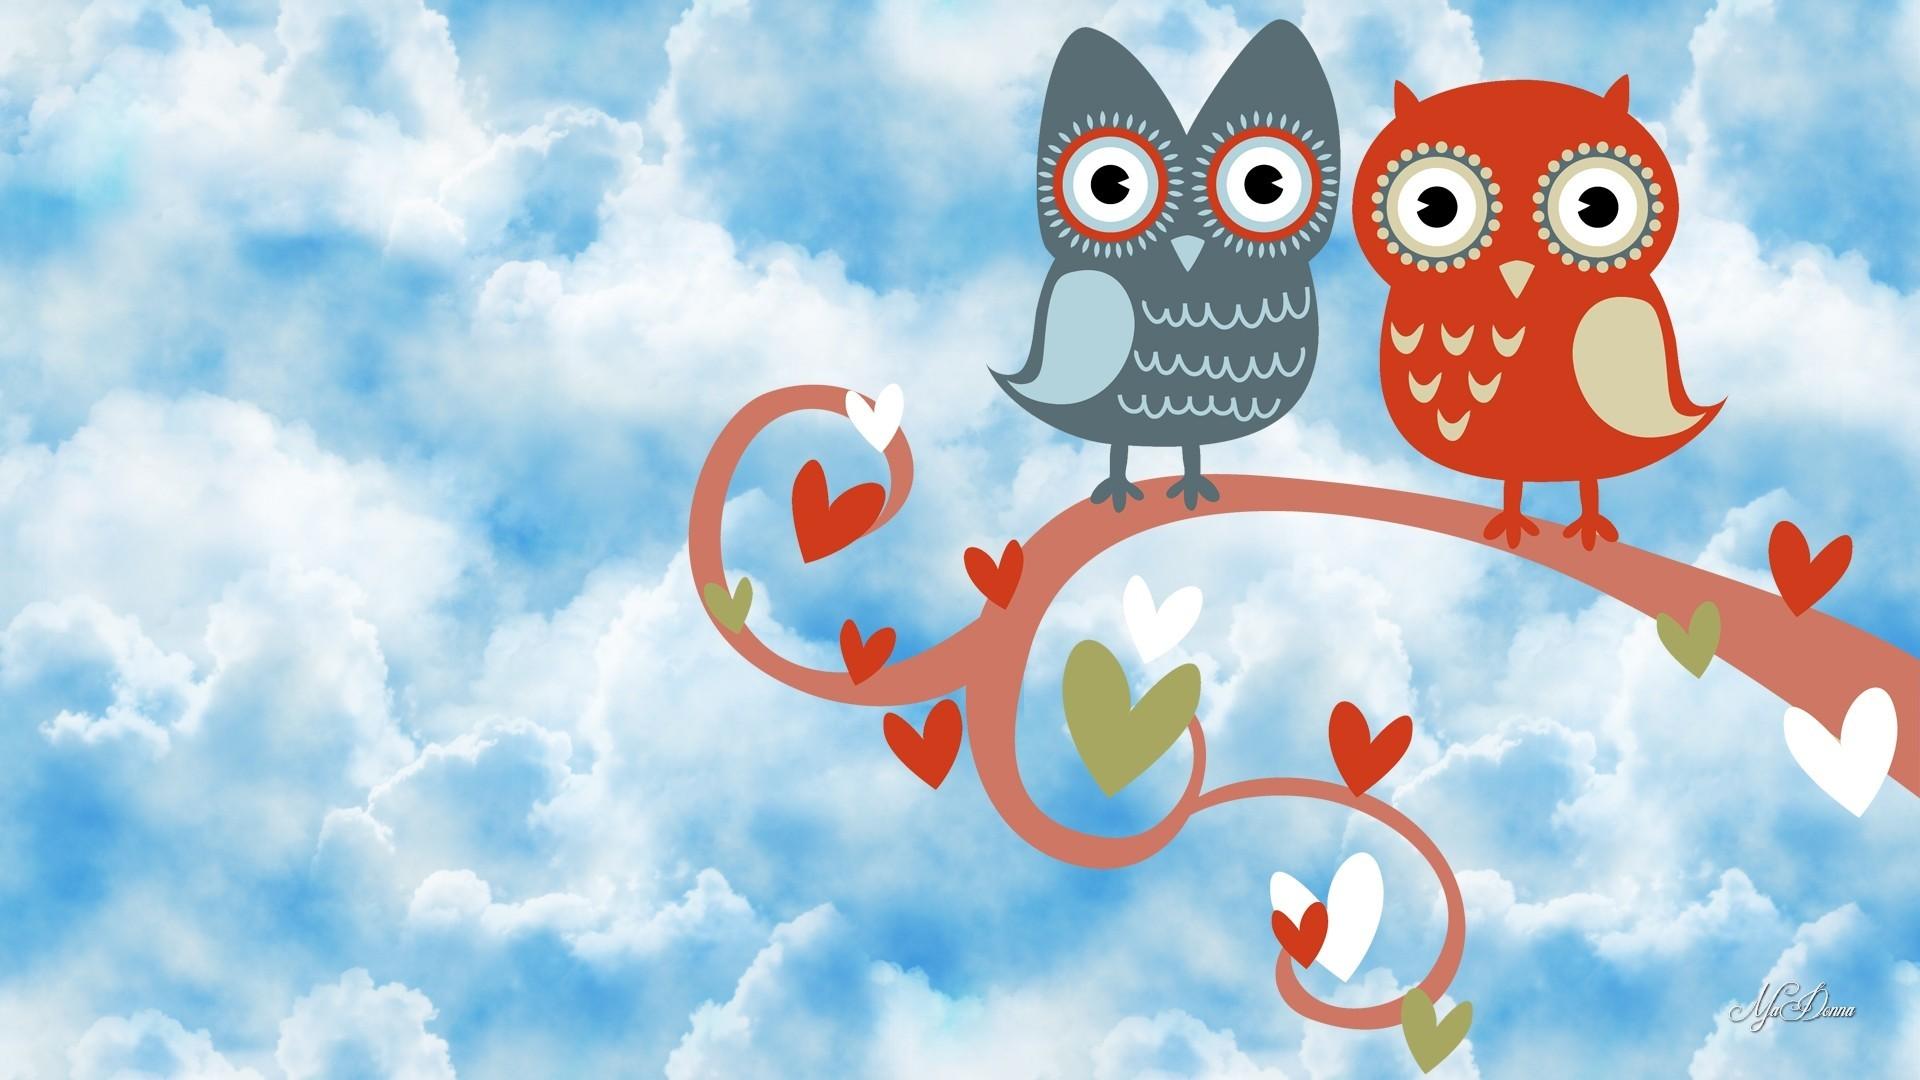 Cute owl tumblr background – photo#26